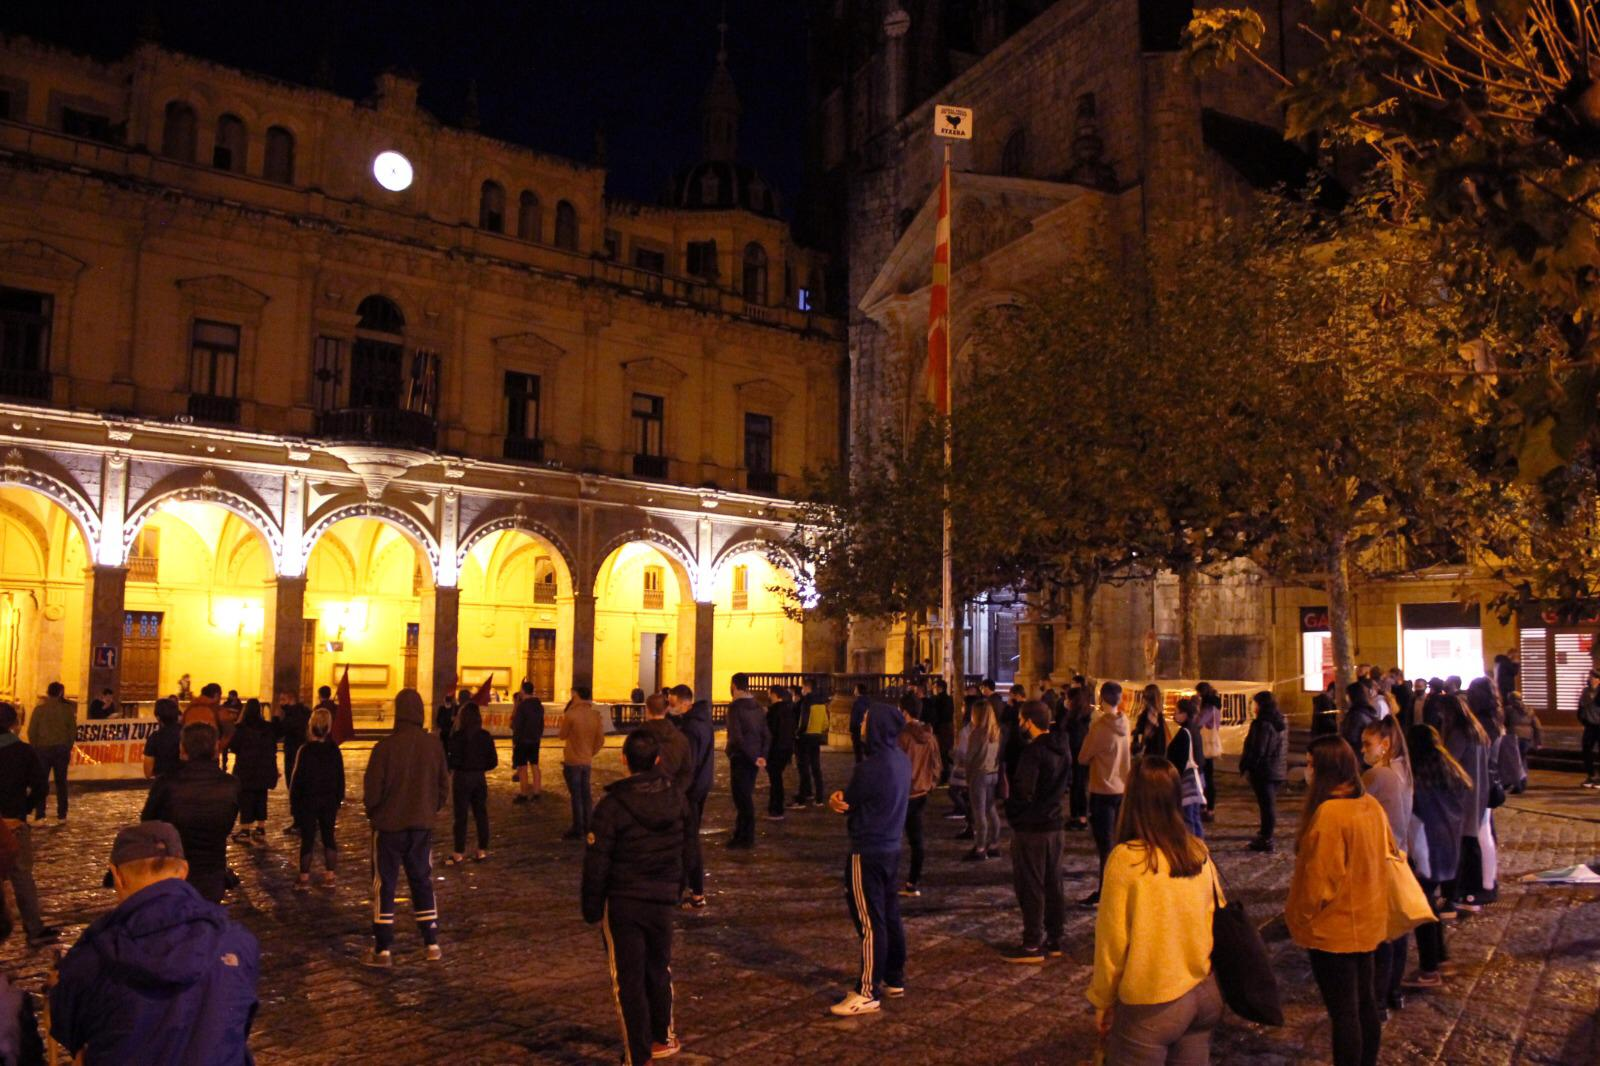 https://www.boltxe.eus/wp-content/uploads/2020/11/1604844186_888_Euskal-Herria-Una-multitud-juvenil-de-la-GKS-se-manifesto.jpg